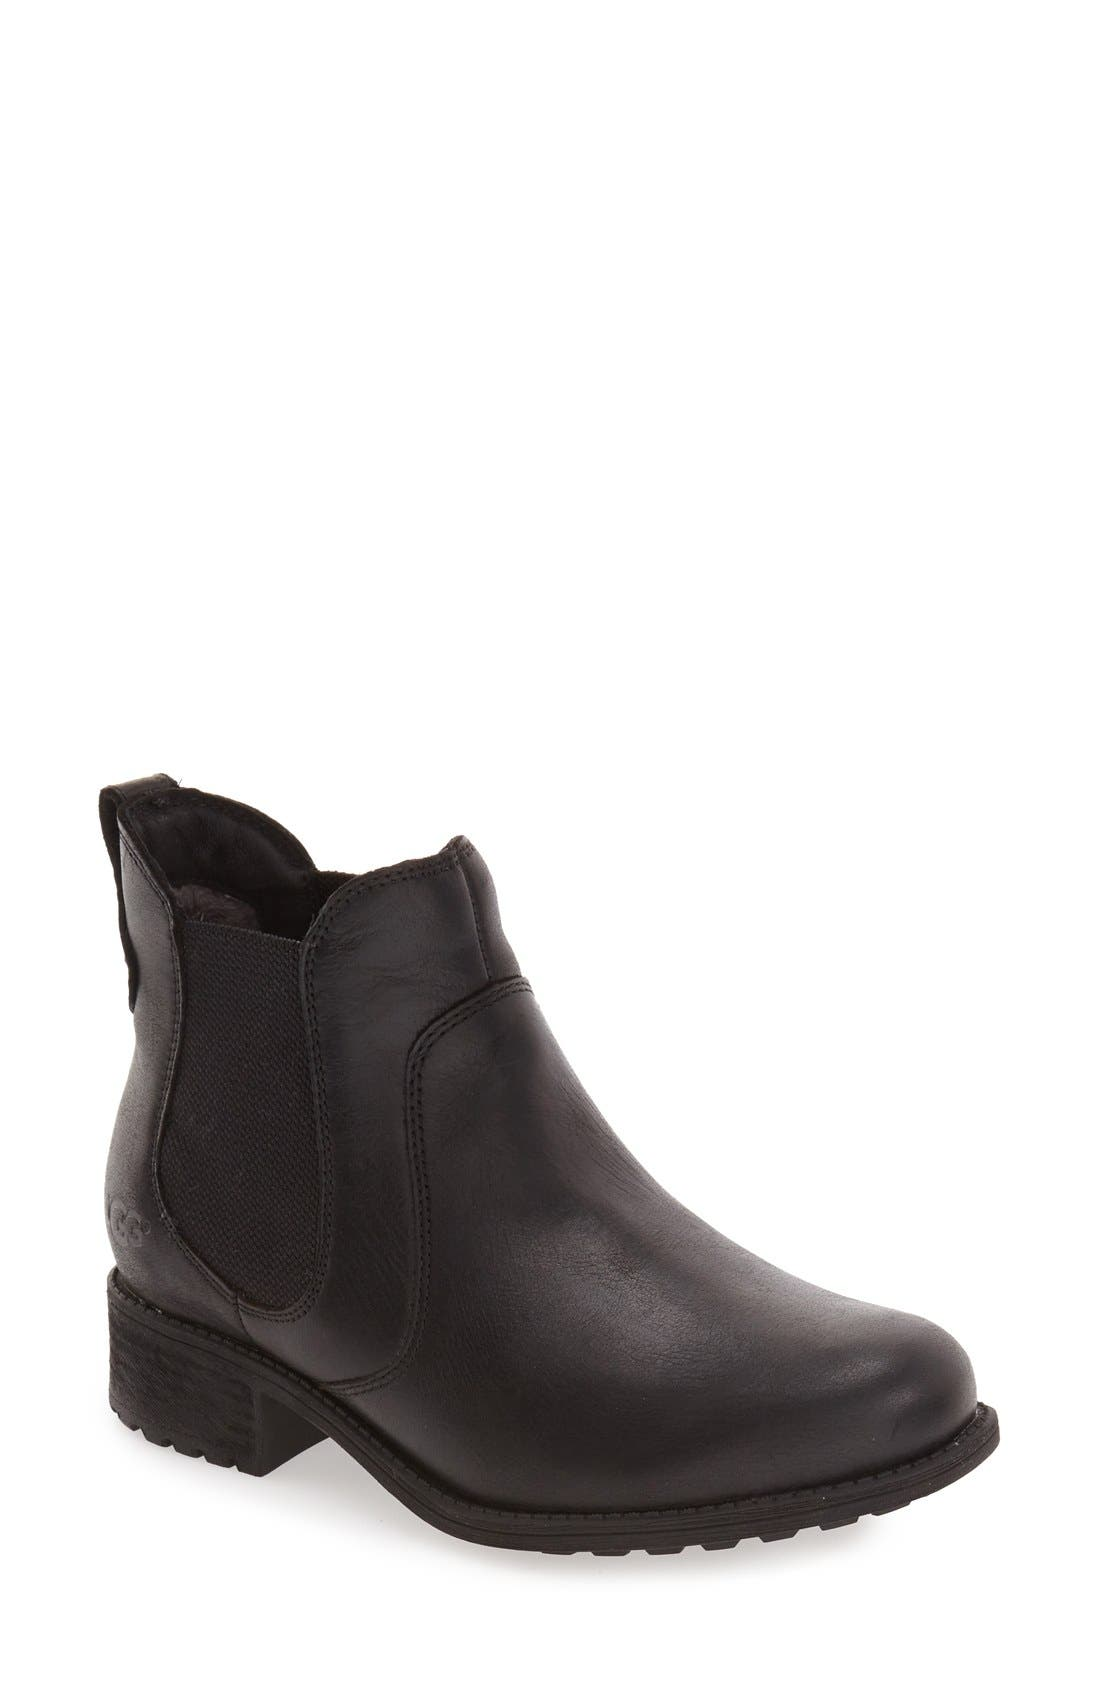 Alternate Image 1 Selected - UGG® Bonham Chelsea Boot (Women)